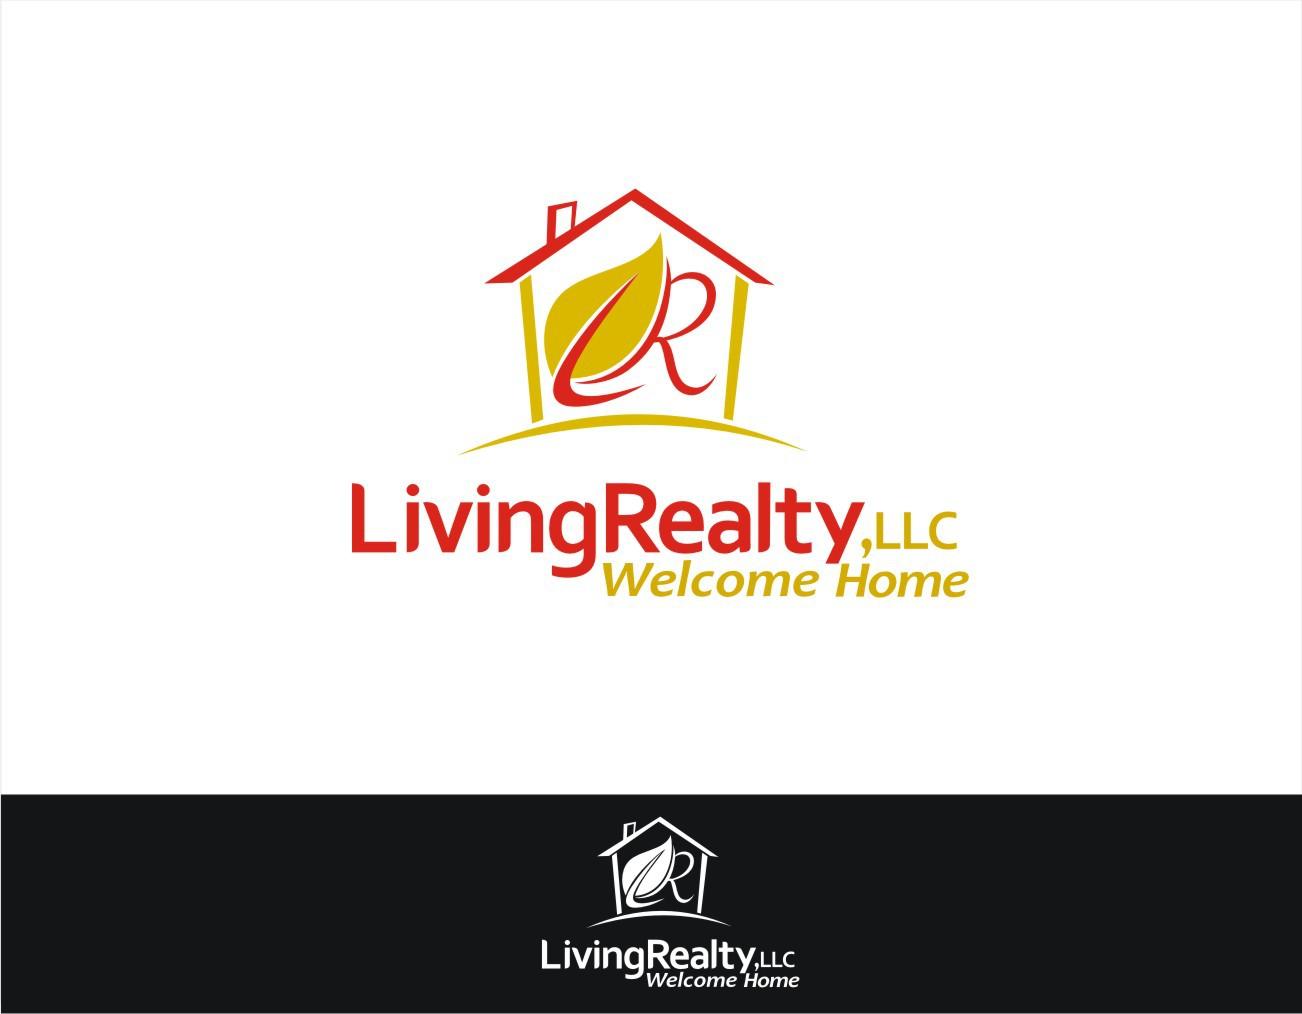 Real Estate Company seeks warm/modern logo